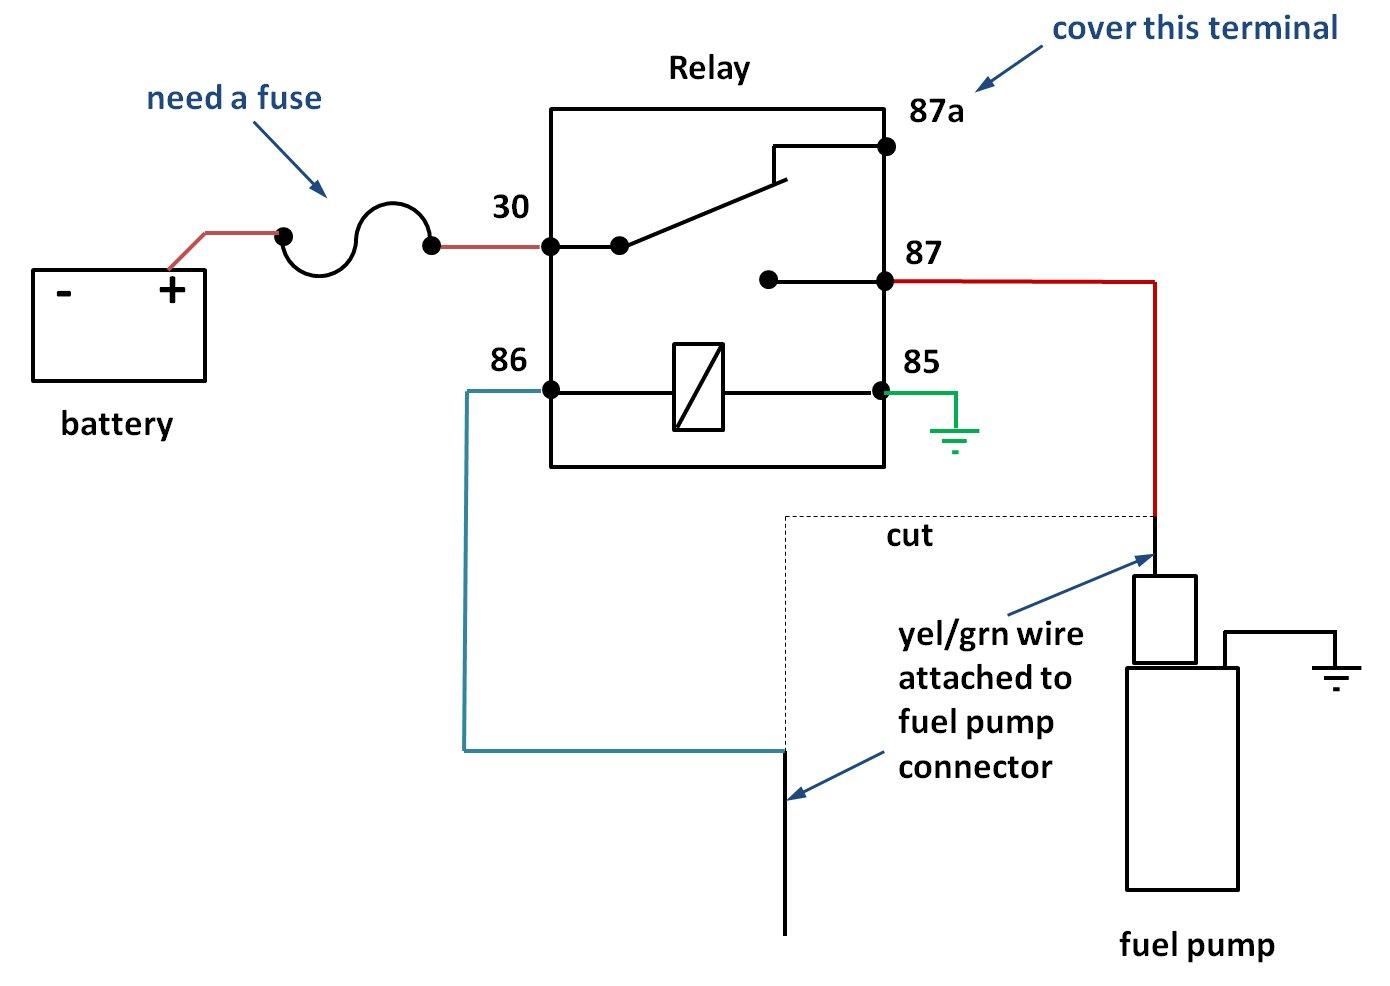 30a relay wiring diagram reese trailer hitch walbro 400 fuel pump install s2ki honda s2000 forums